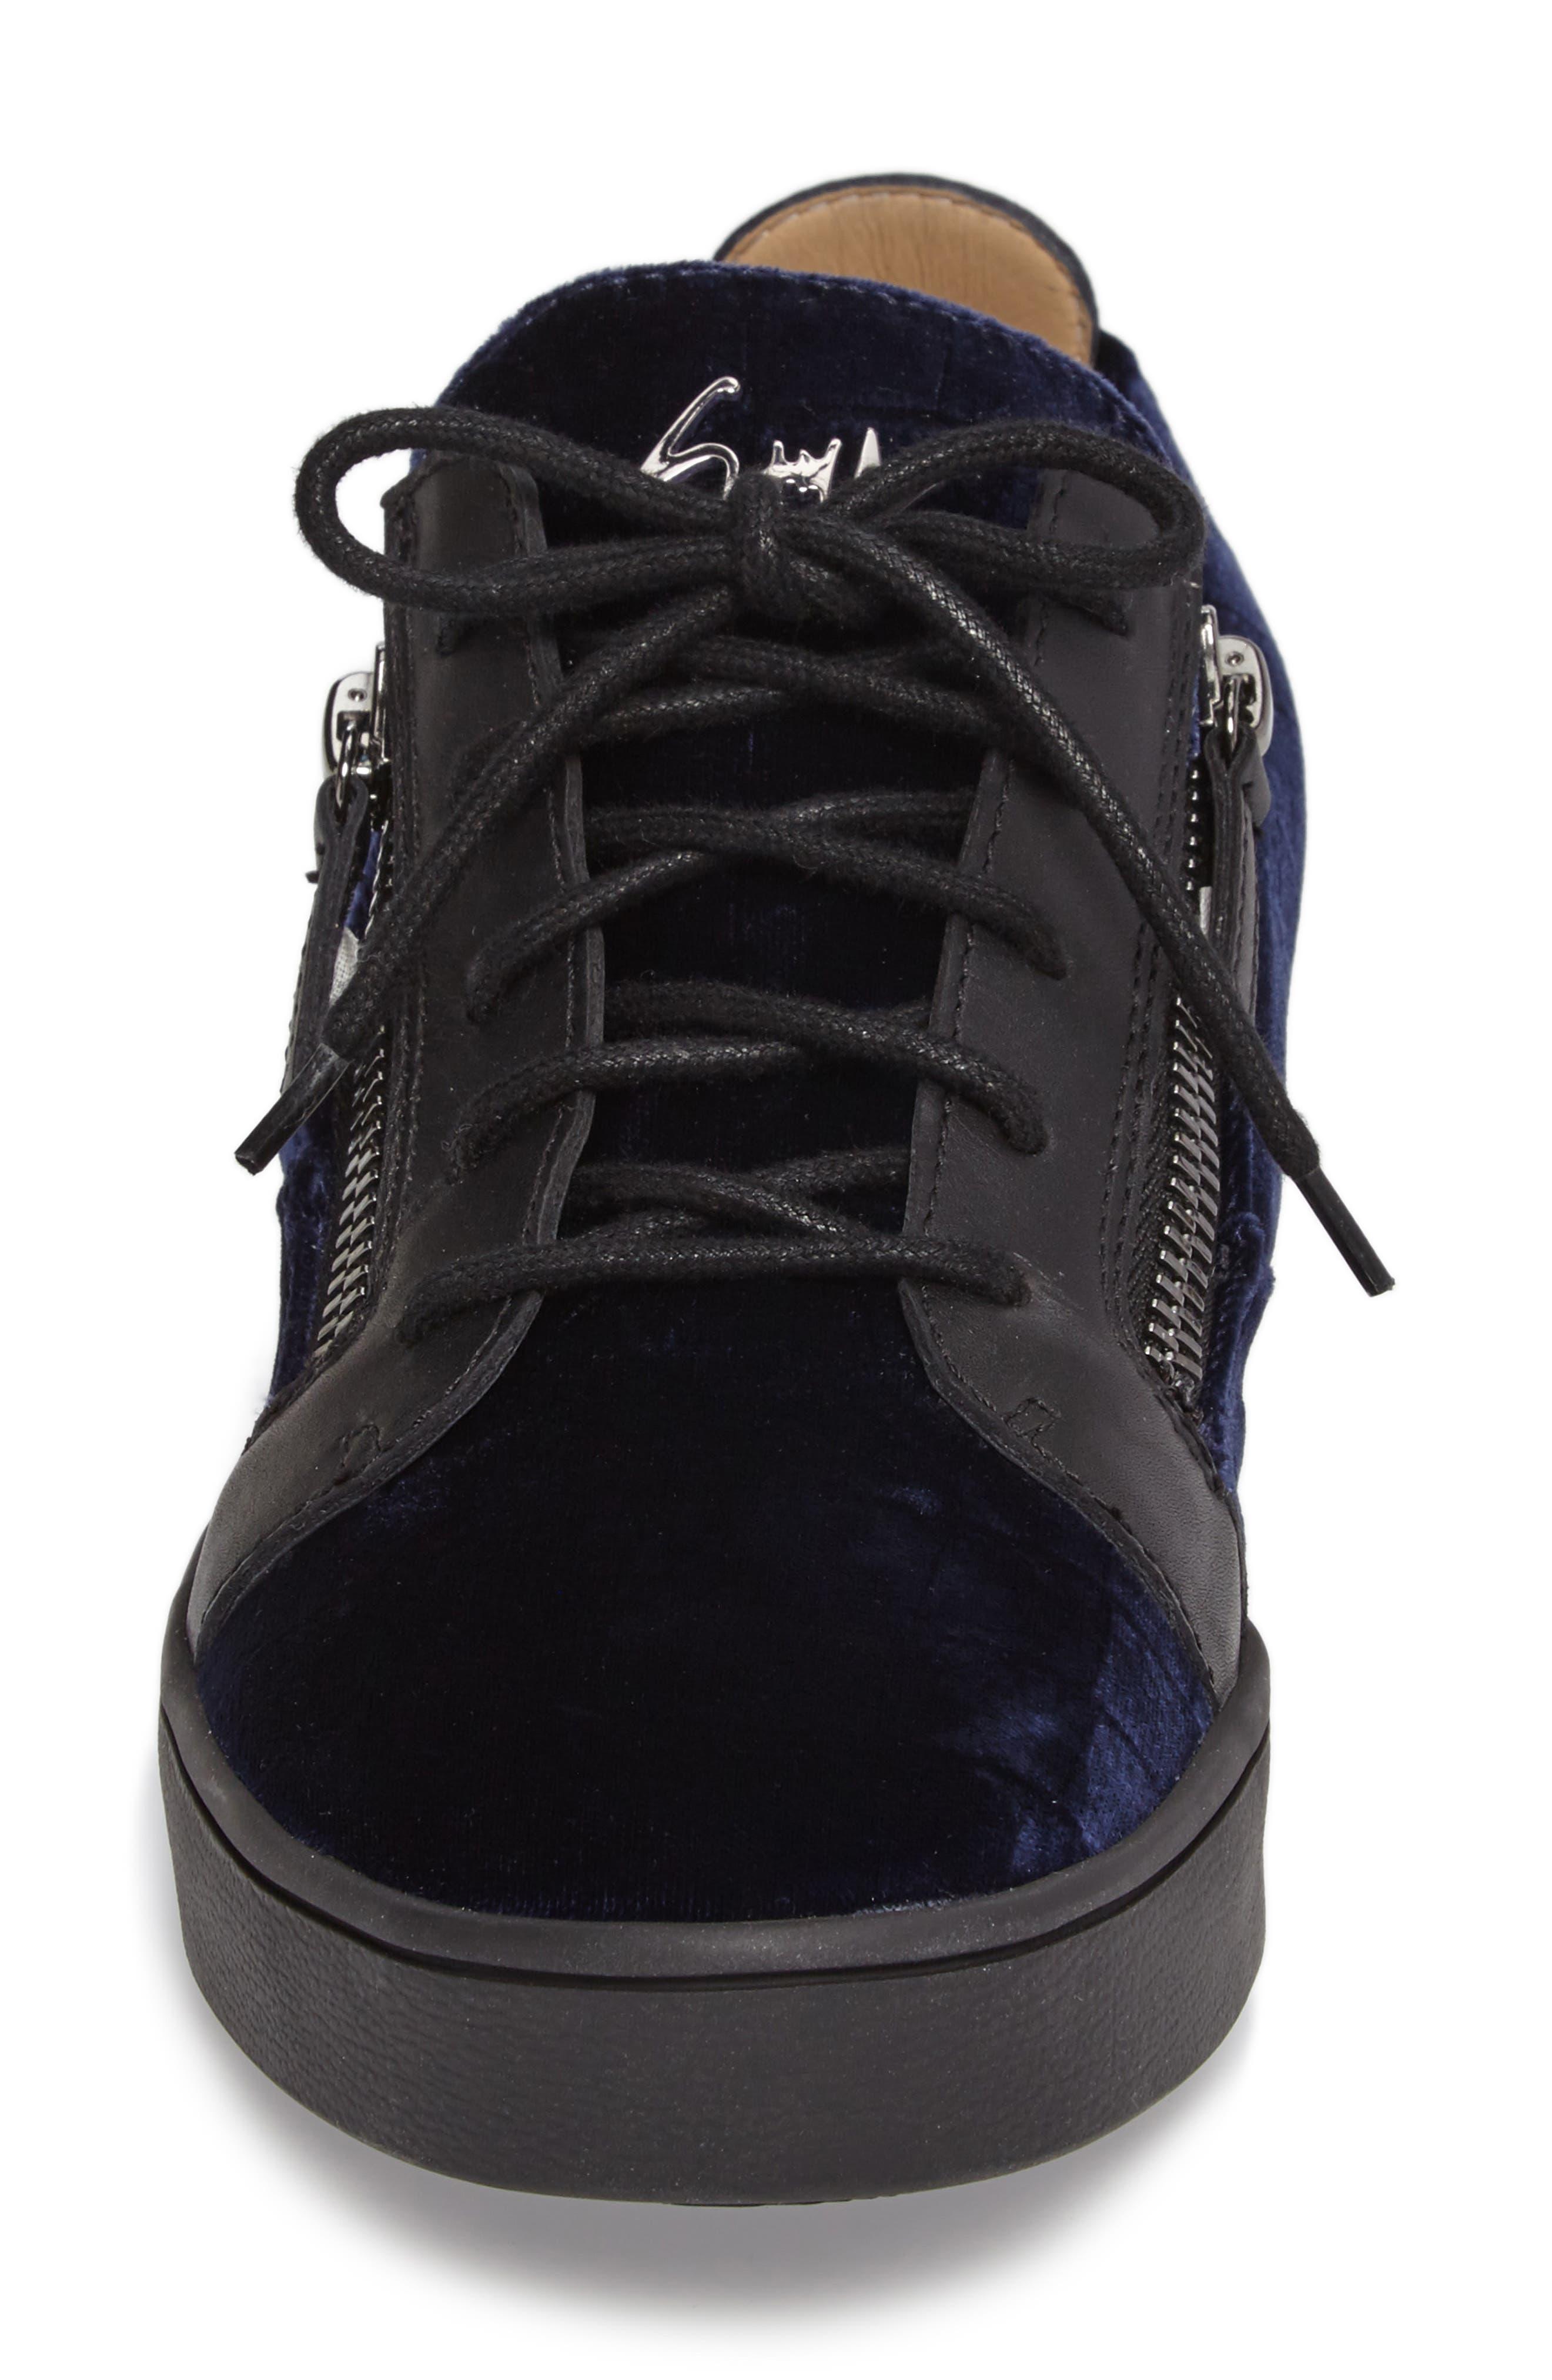 Low Top Sneaker,                             Alternate thumbnail 4, color,                             Navy